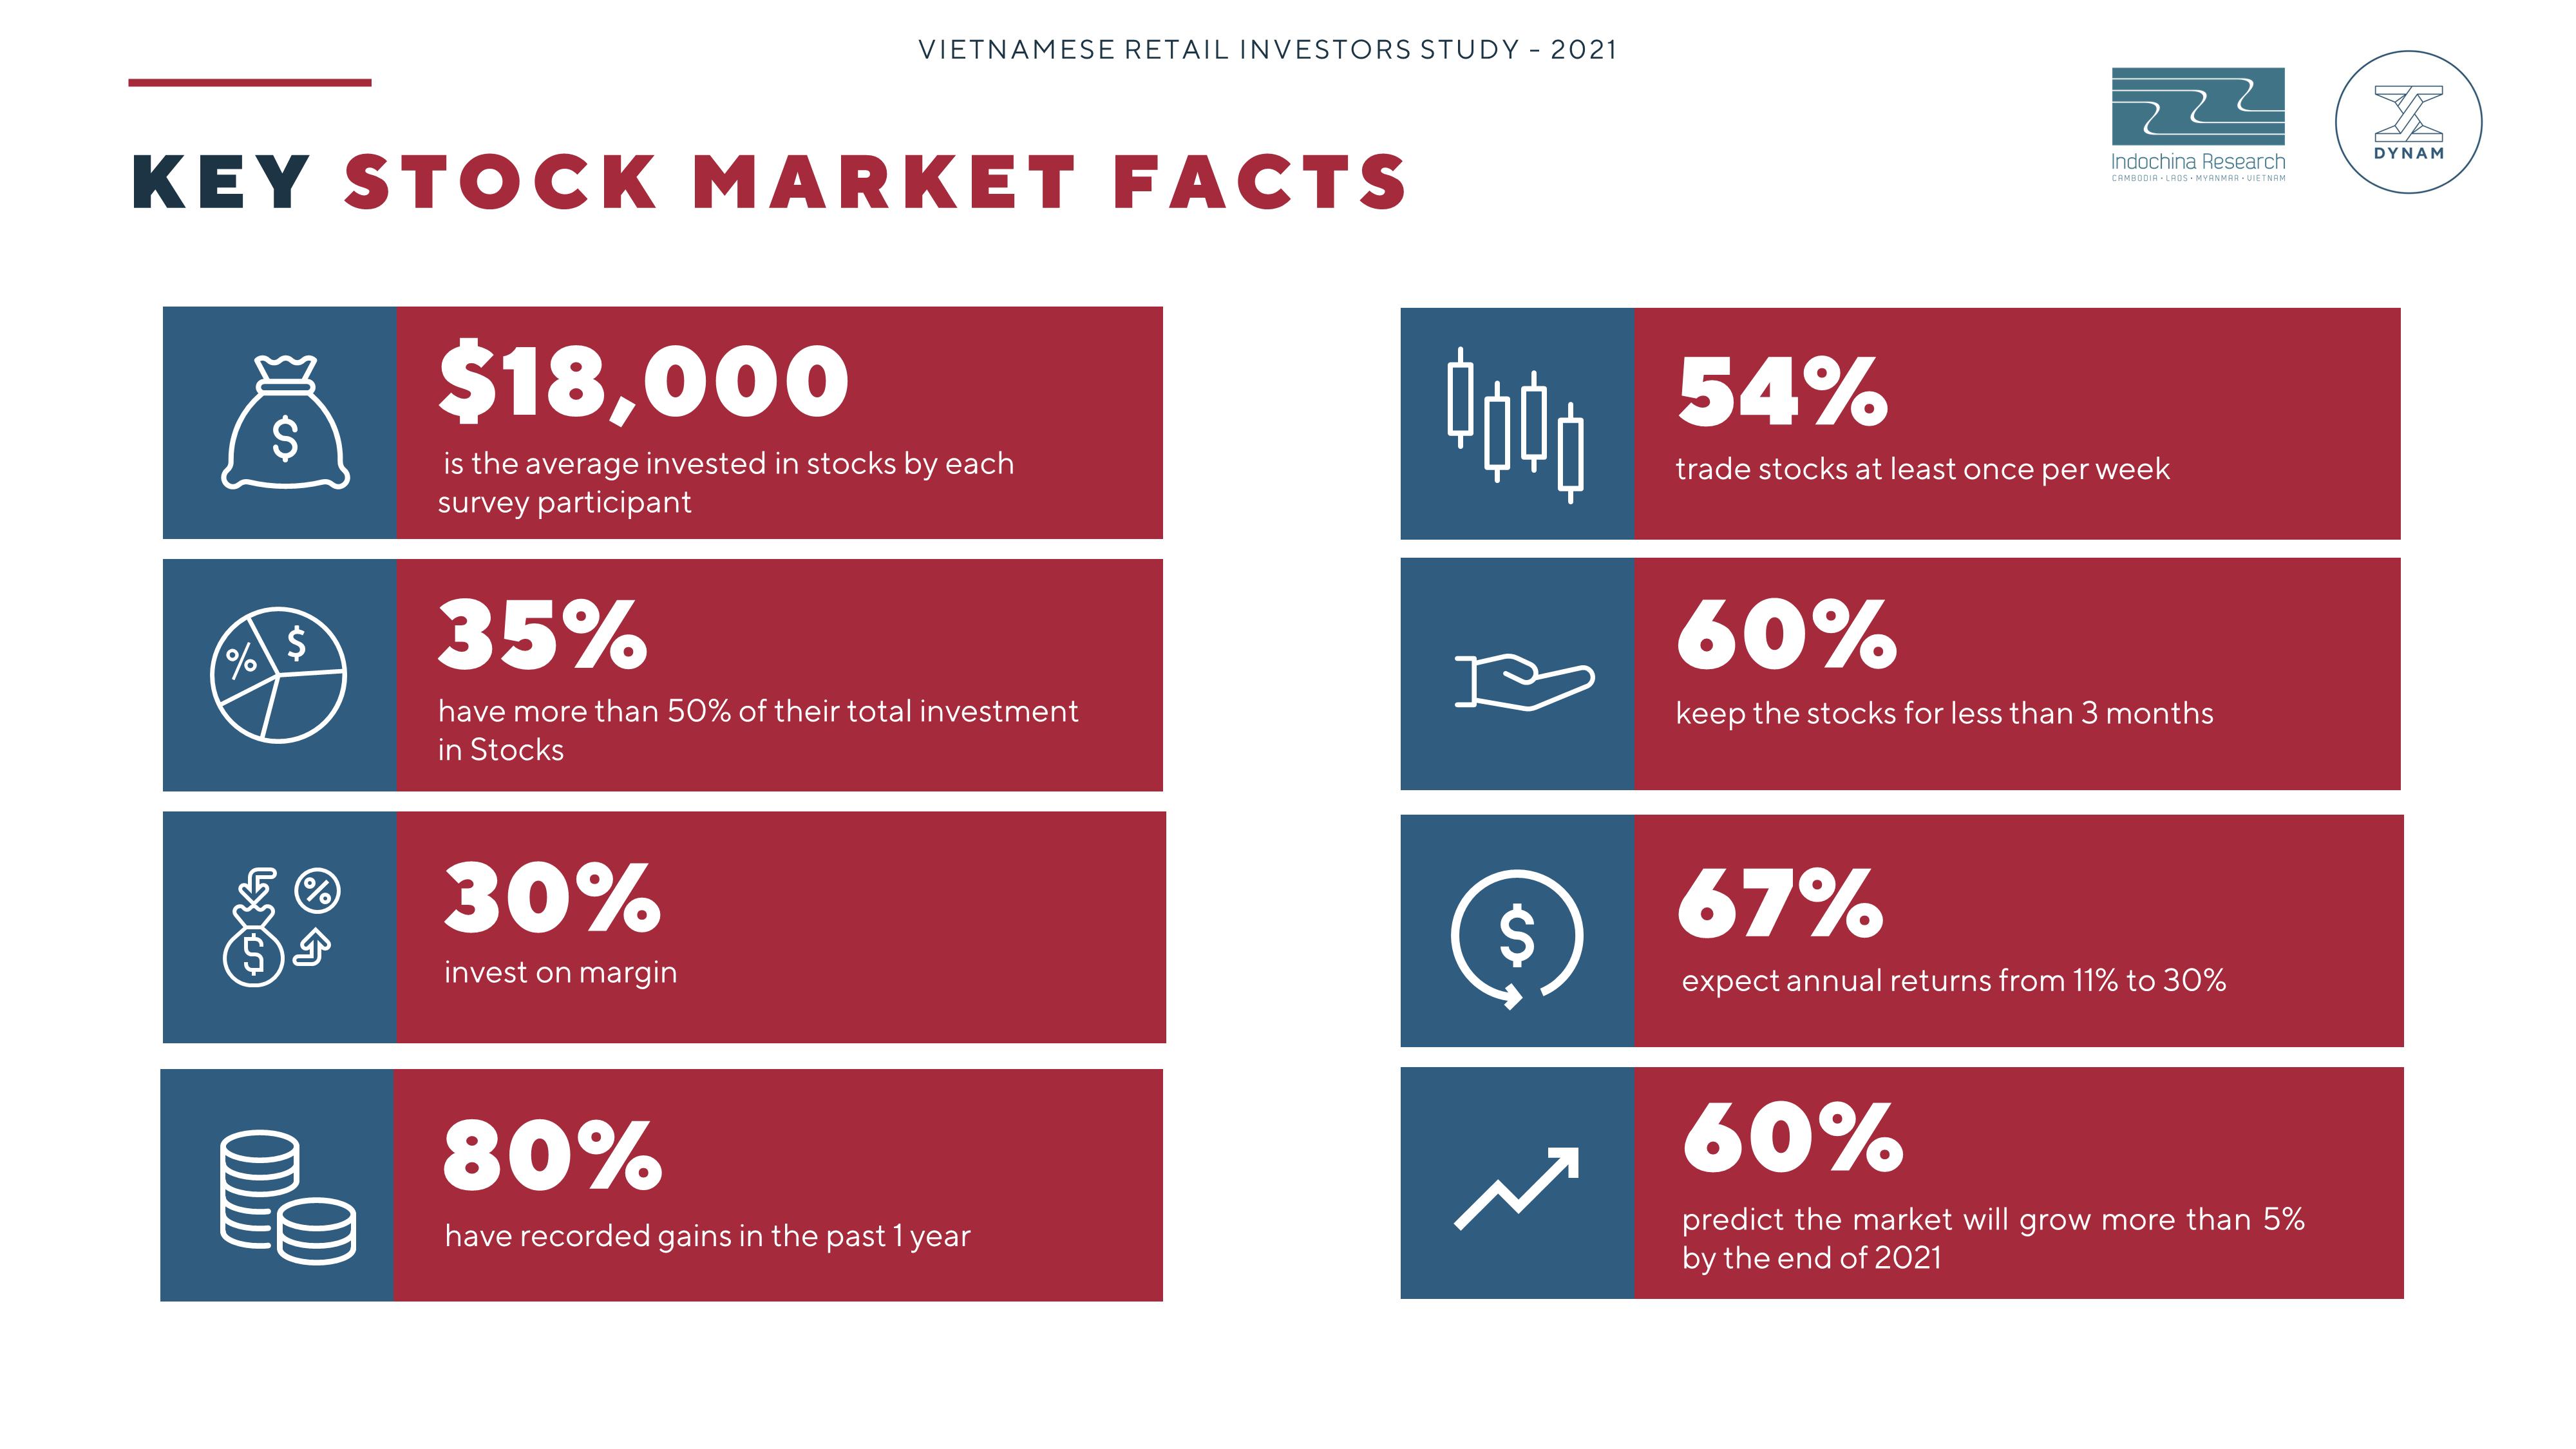 Investor - Key Stock Market Facts